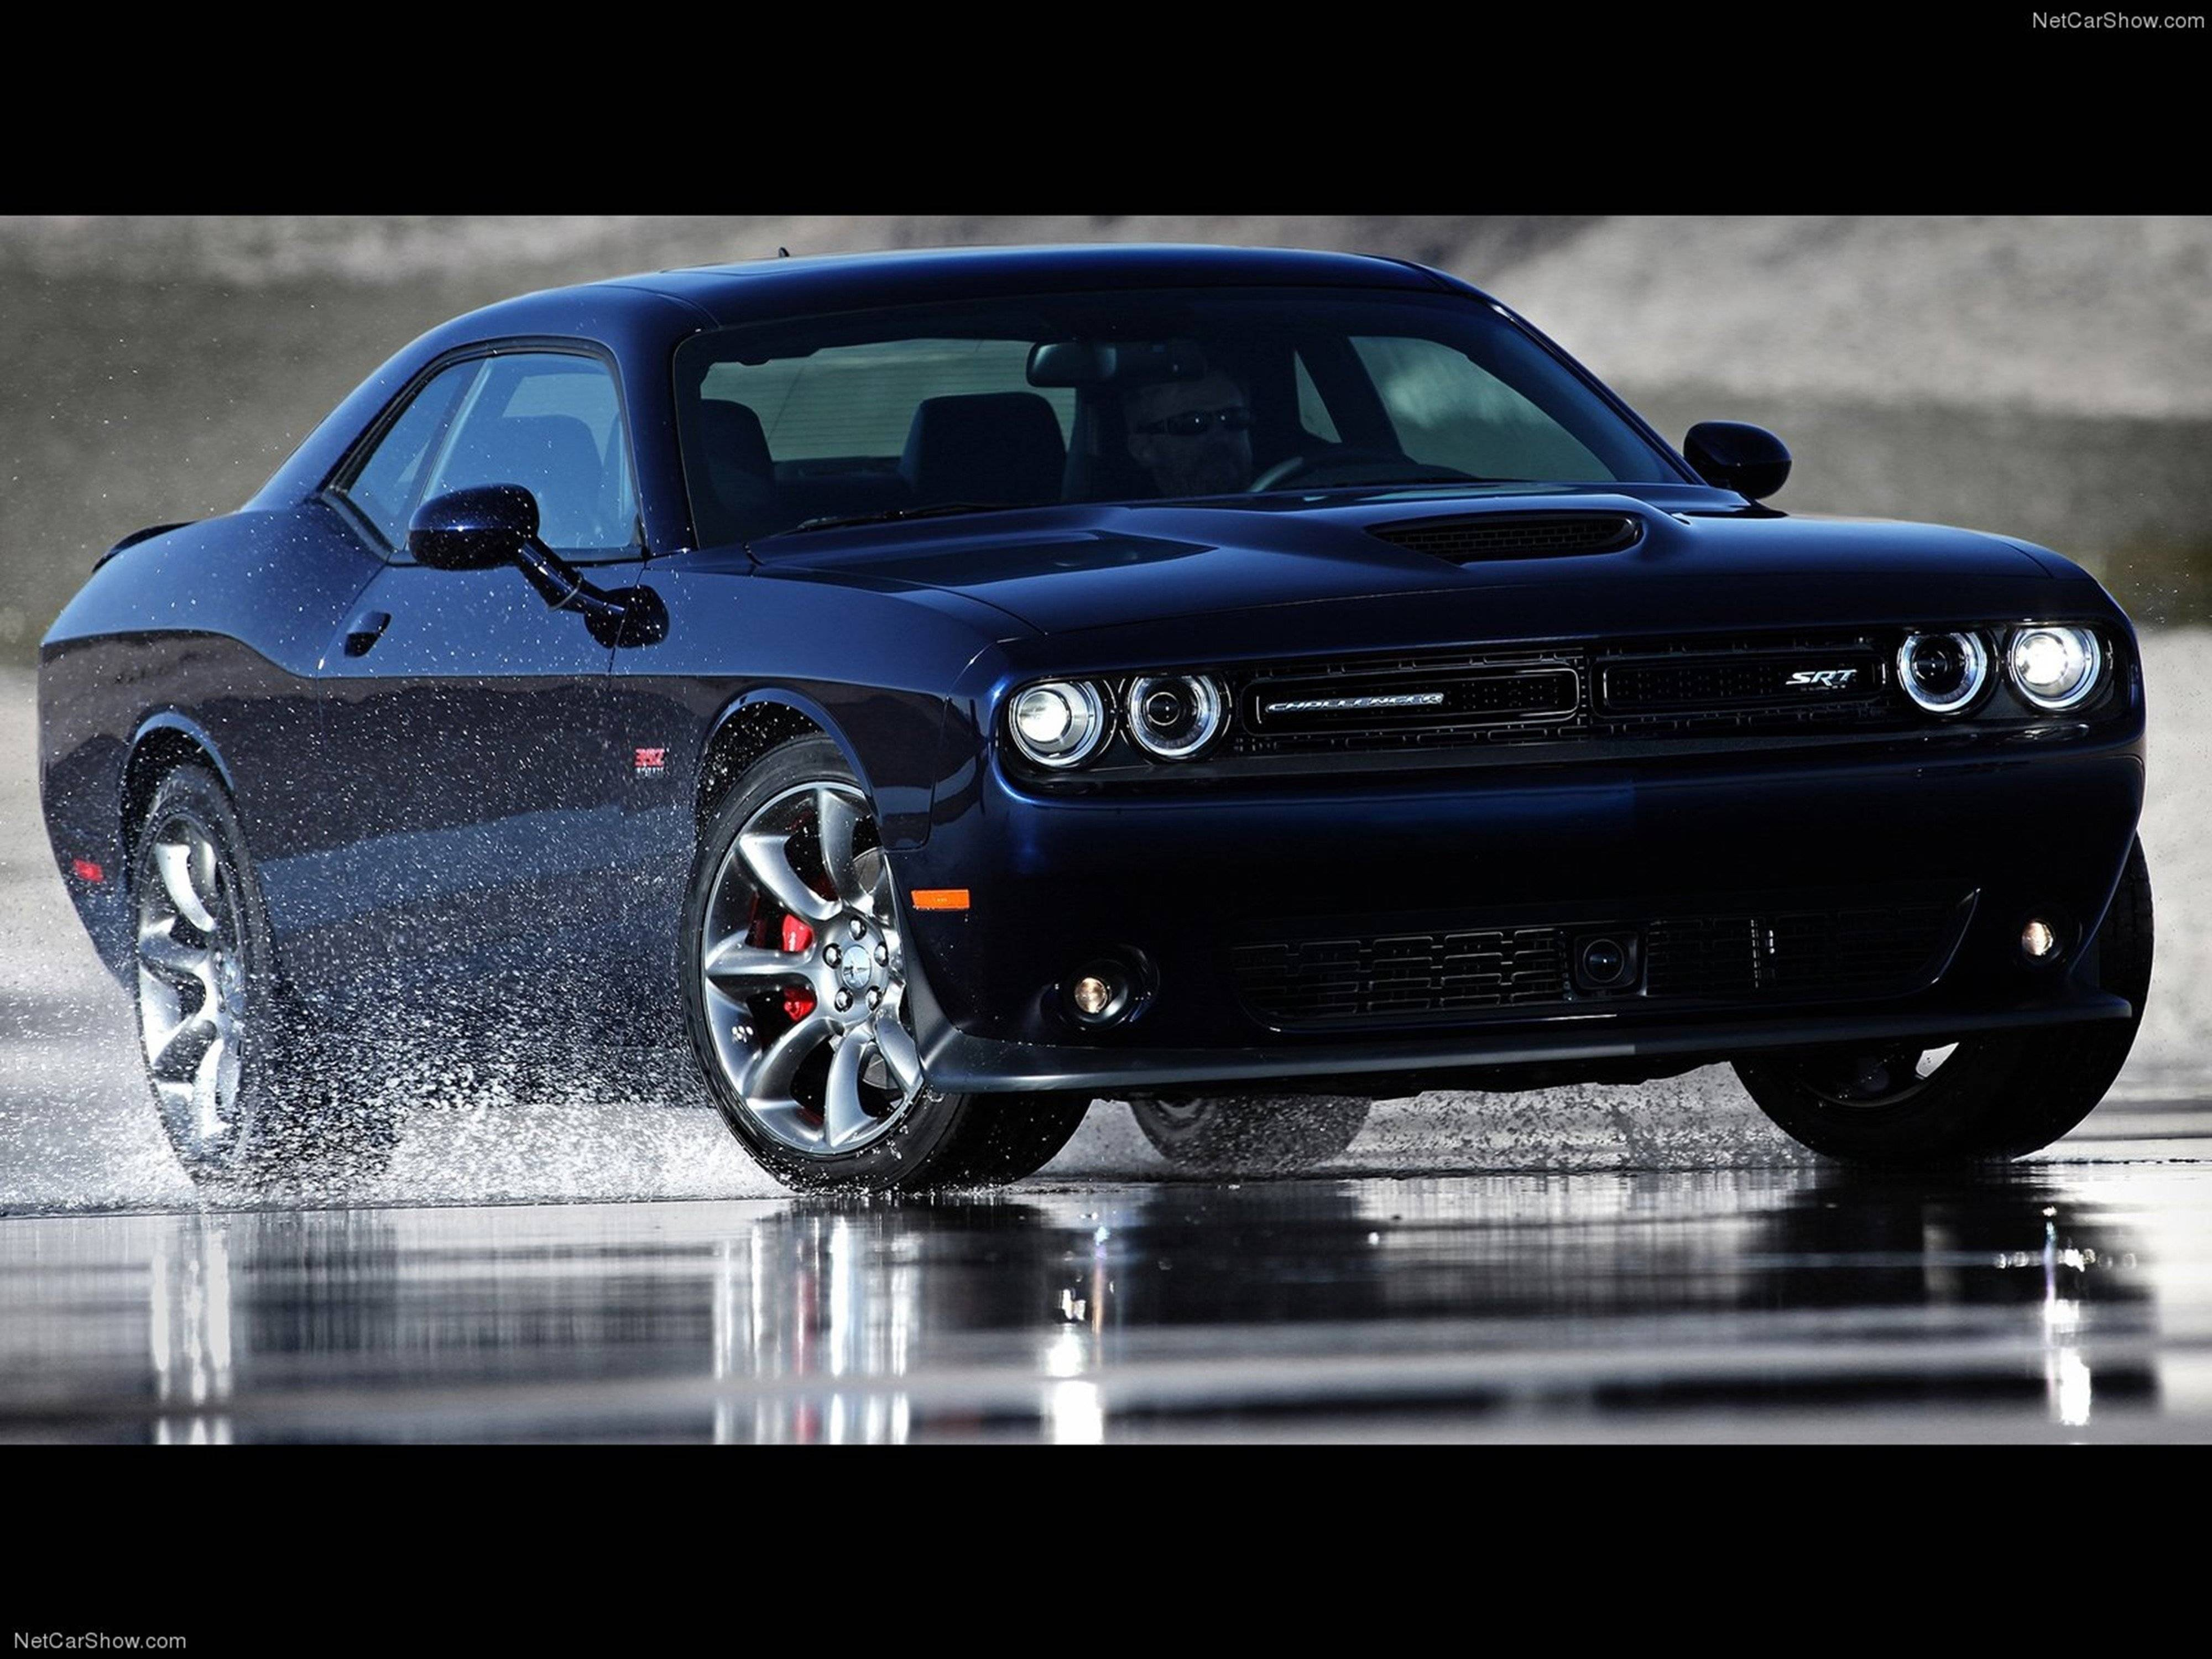 Dodge challenger srt 2015 muscle car car sport black wallpaper